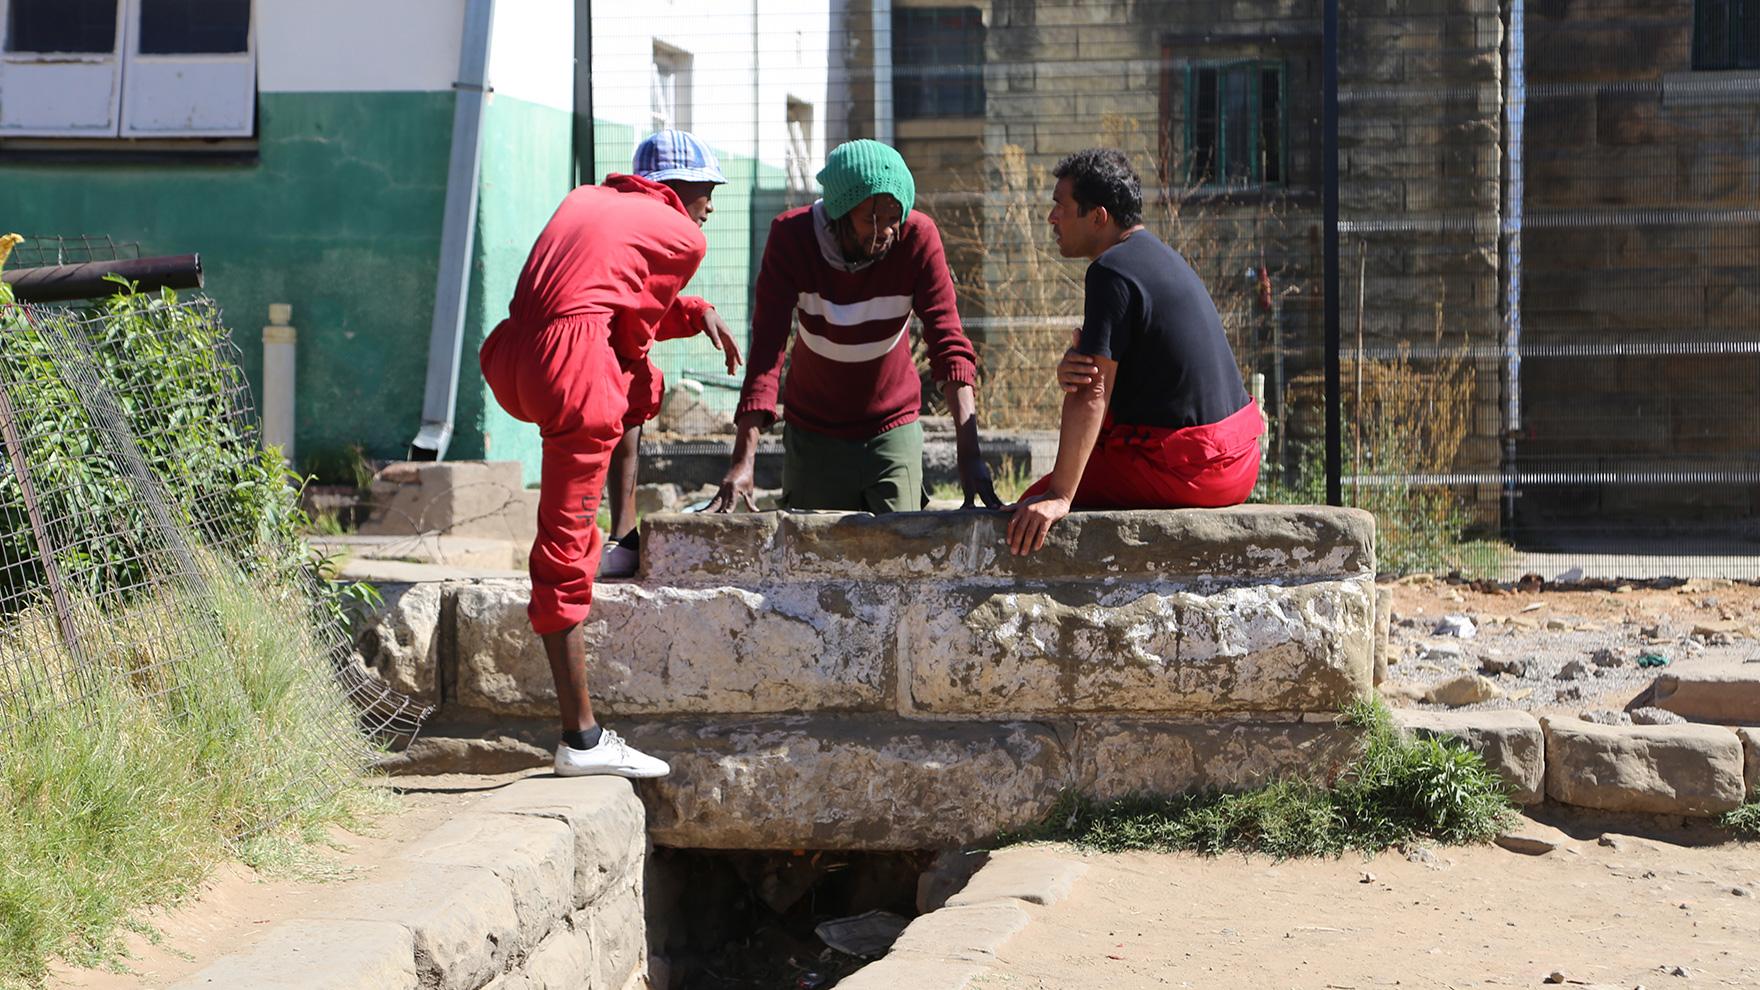 IWTP-404-Lesotho-Publicity-Still-Emporium-38